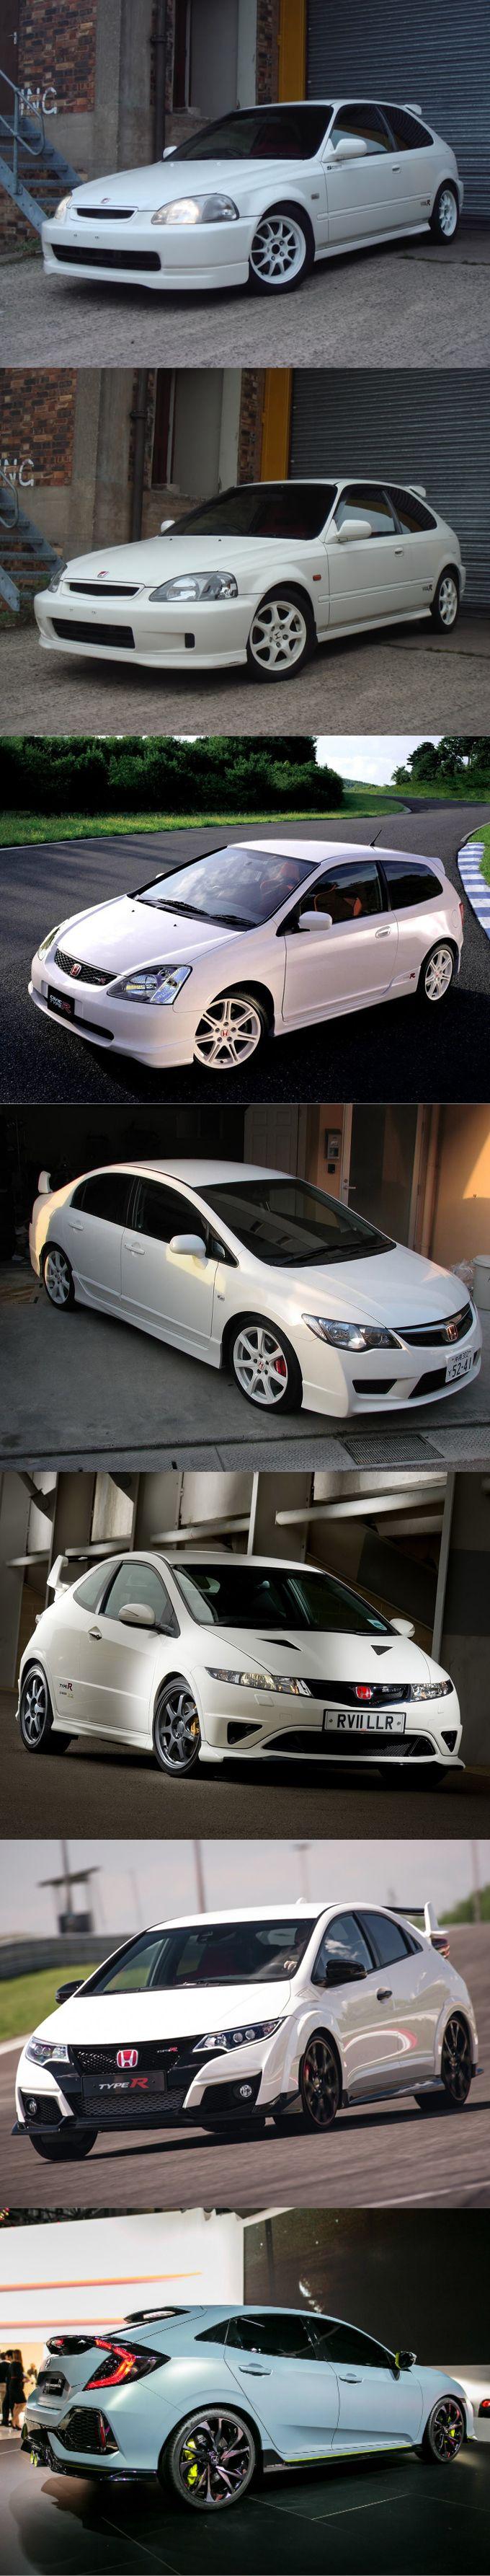 Honda civic type r evolution 1997 ek9 182hp 1999 ek9 facelift 182hp 2001